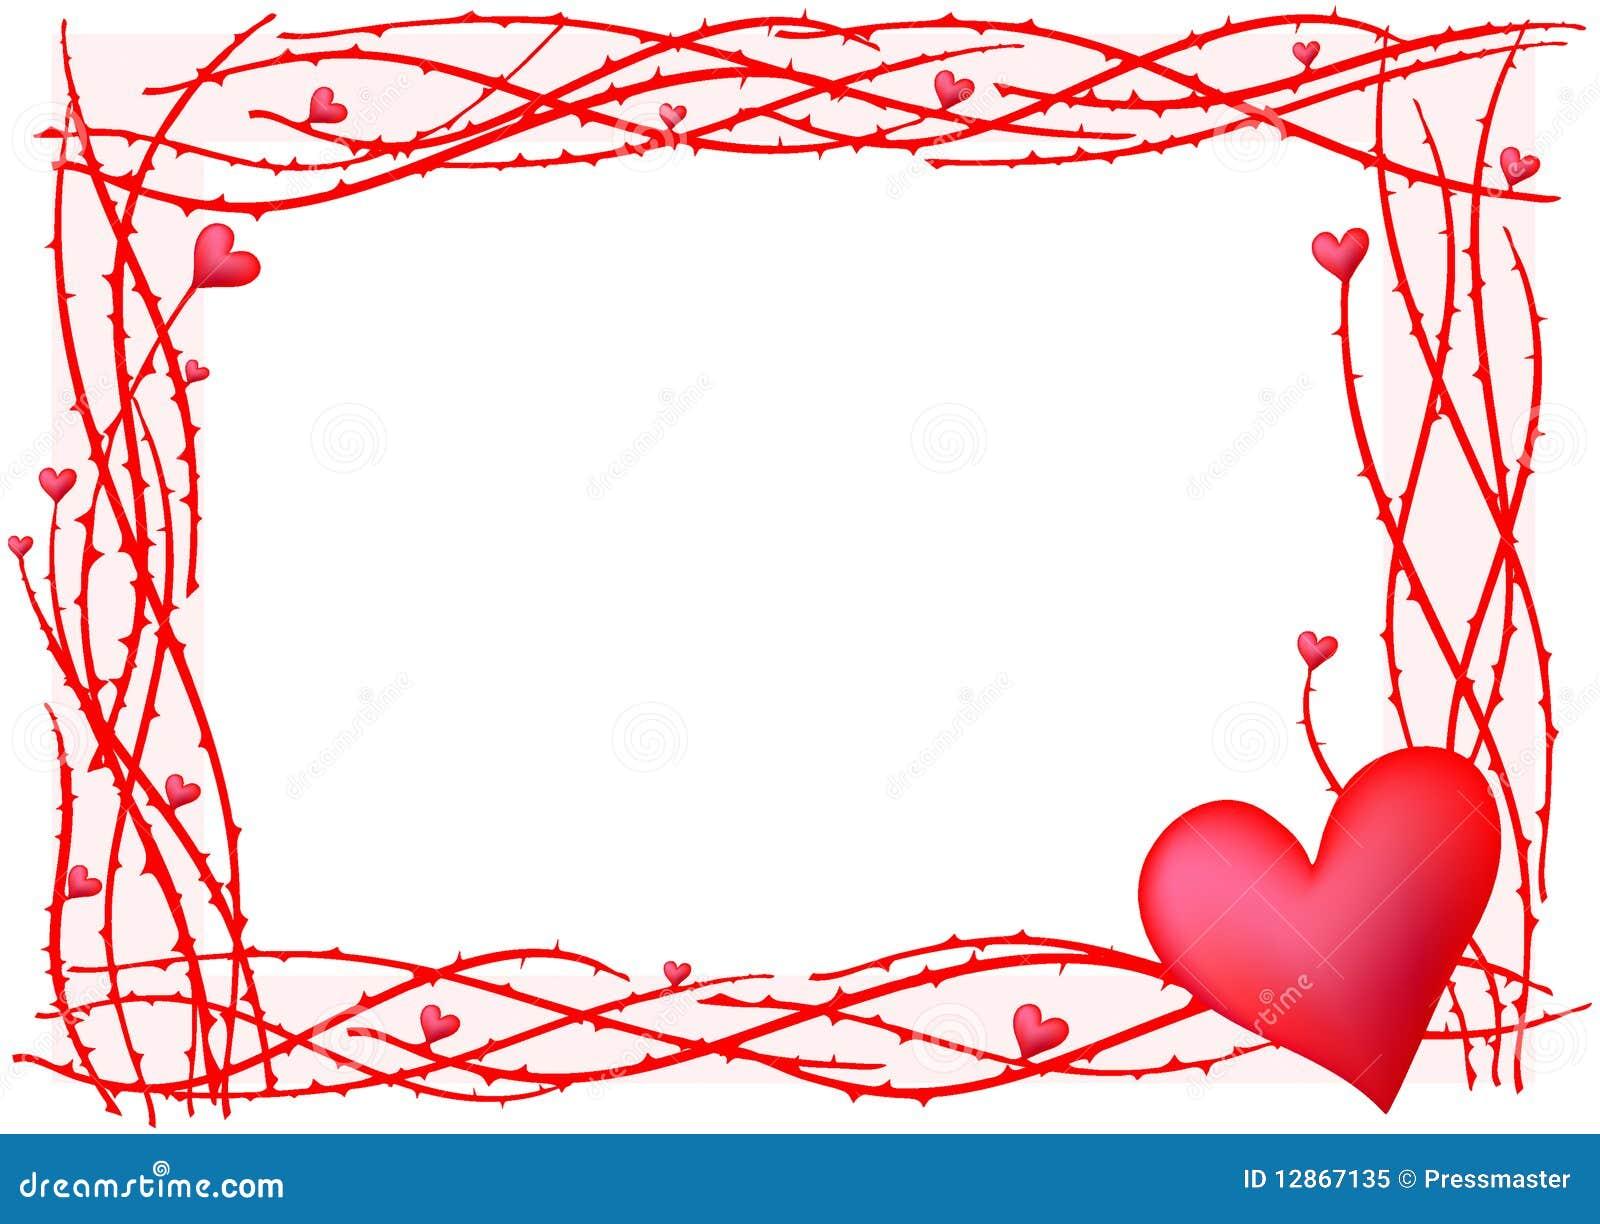 Red valentine frame stock illustration. Illustration of background ...